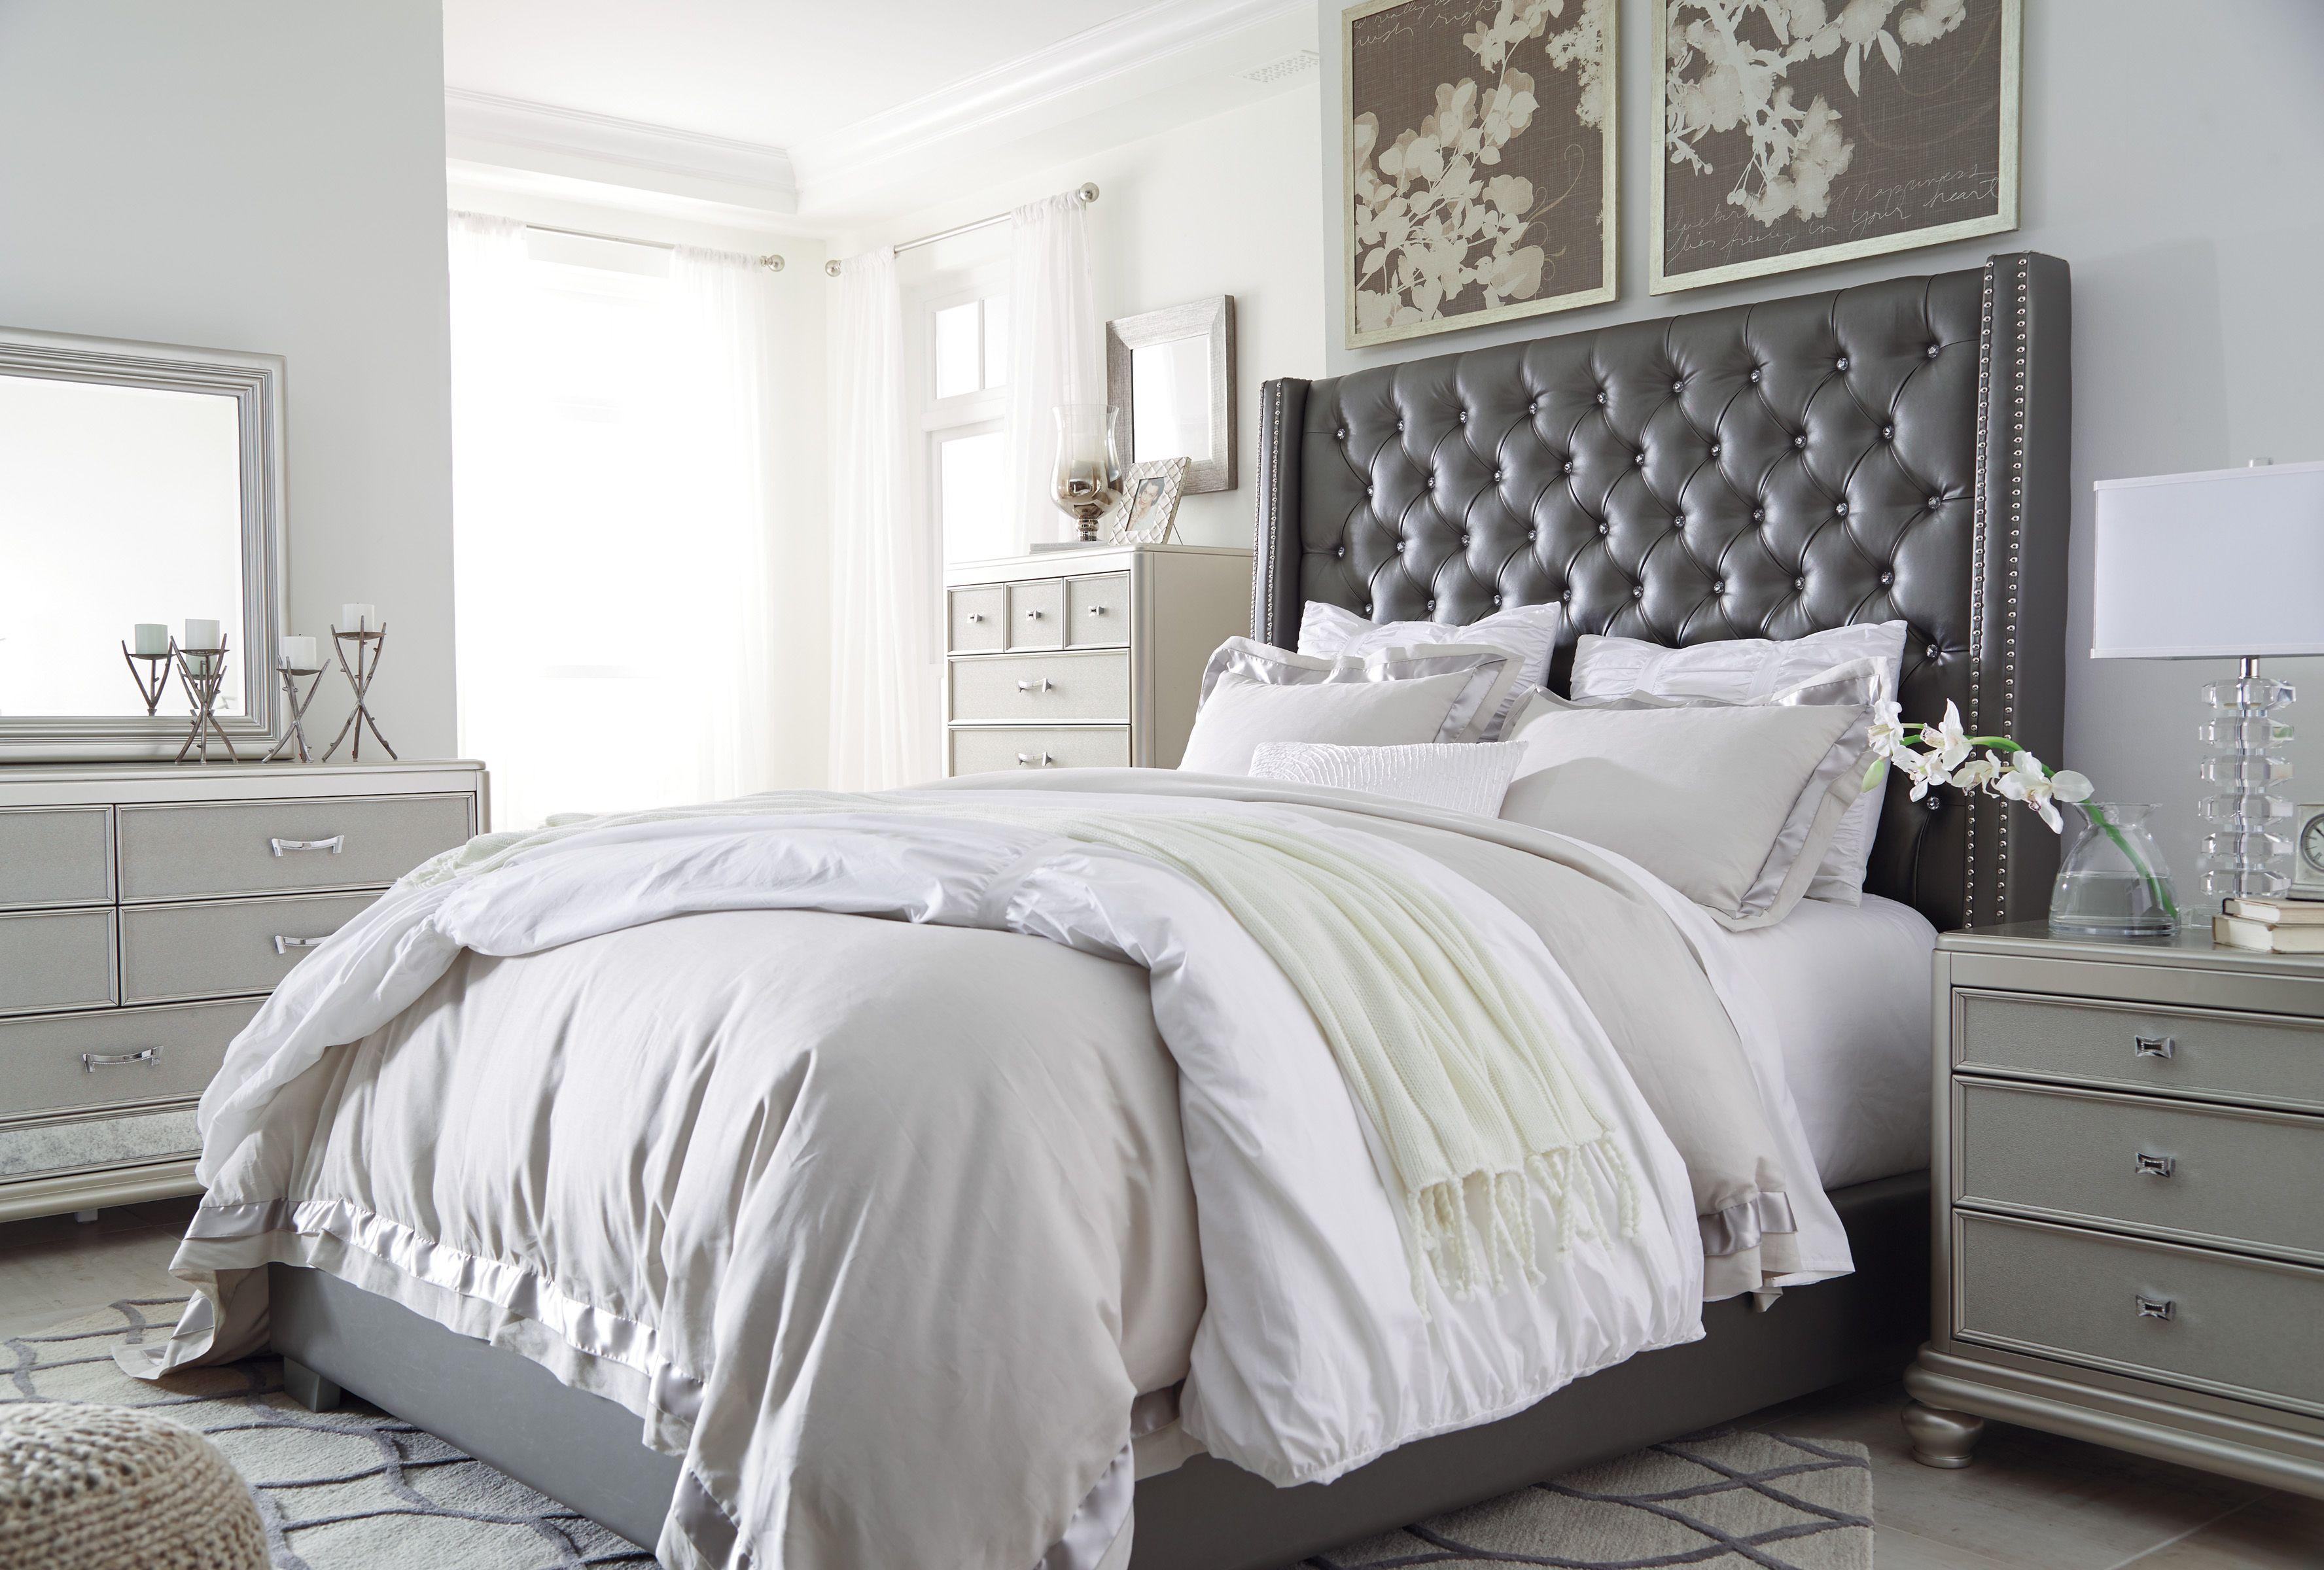 Ashley Coralayne B650 Upholstered Bed Bedroom Set Upholstered Bedroom Set Bedroom Furniture Sets King Upholstered Bed